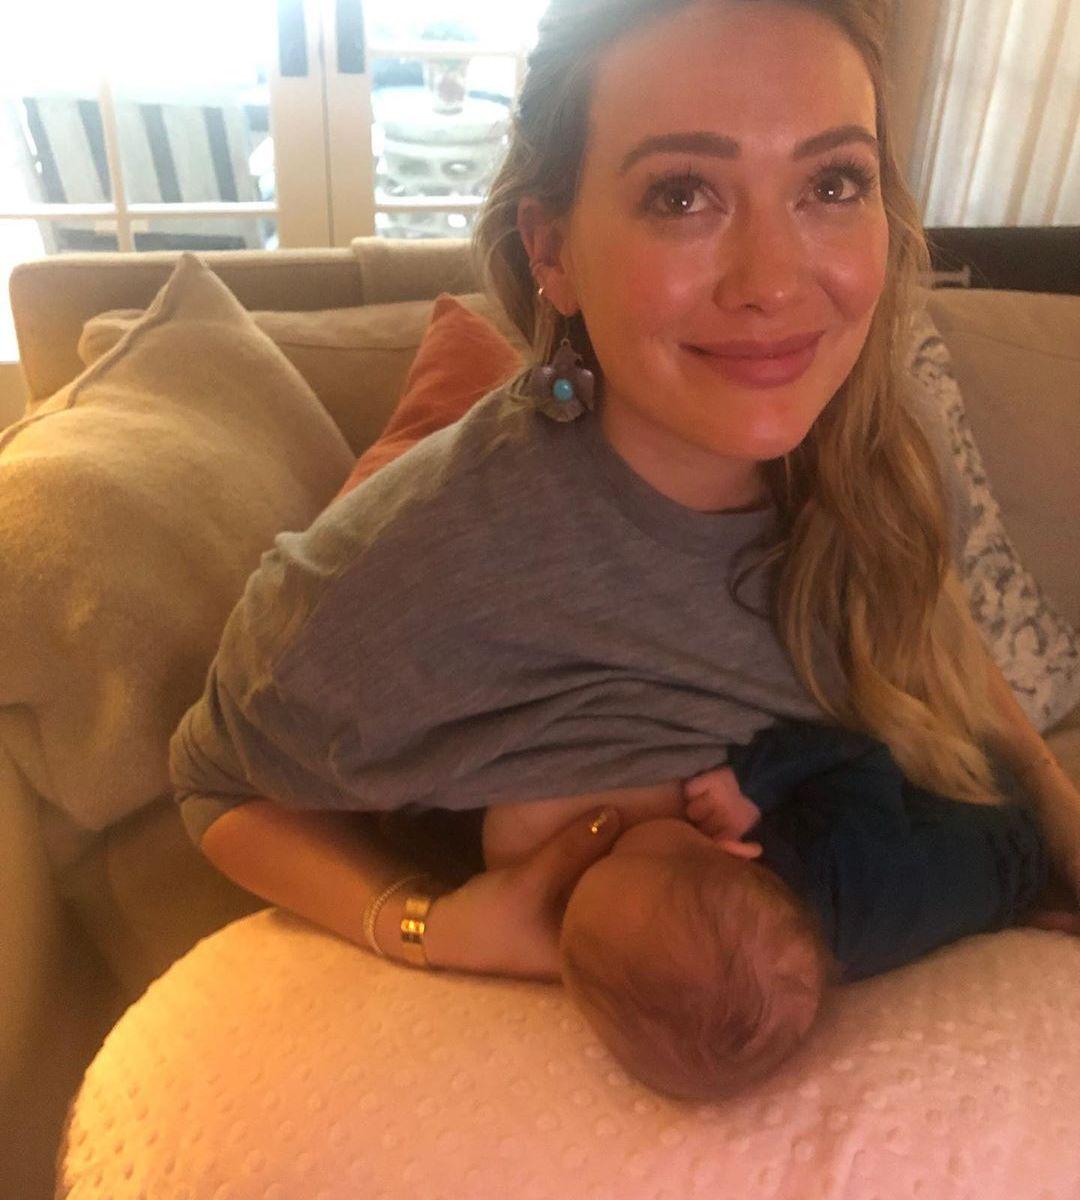 Amy Schumer Tit Pics celebrity breast-feeding clapbacks: stars who know that fed